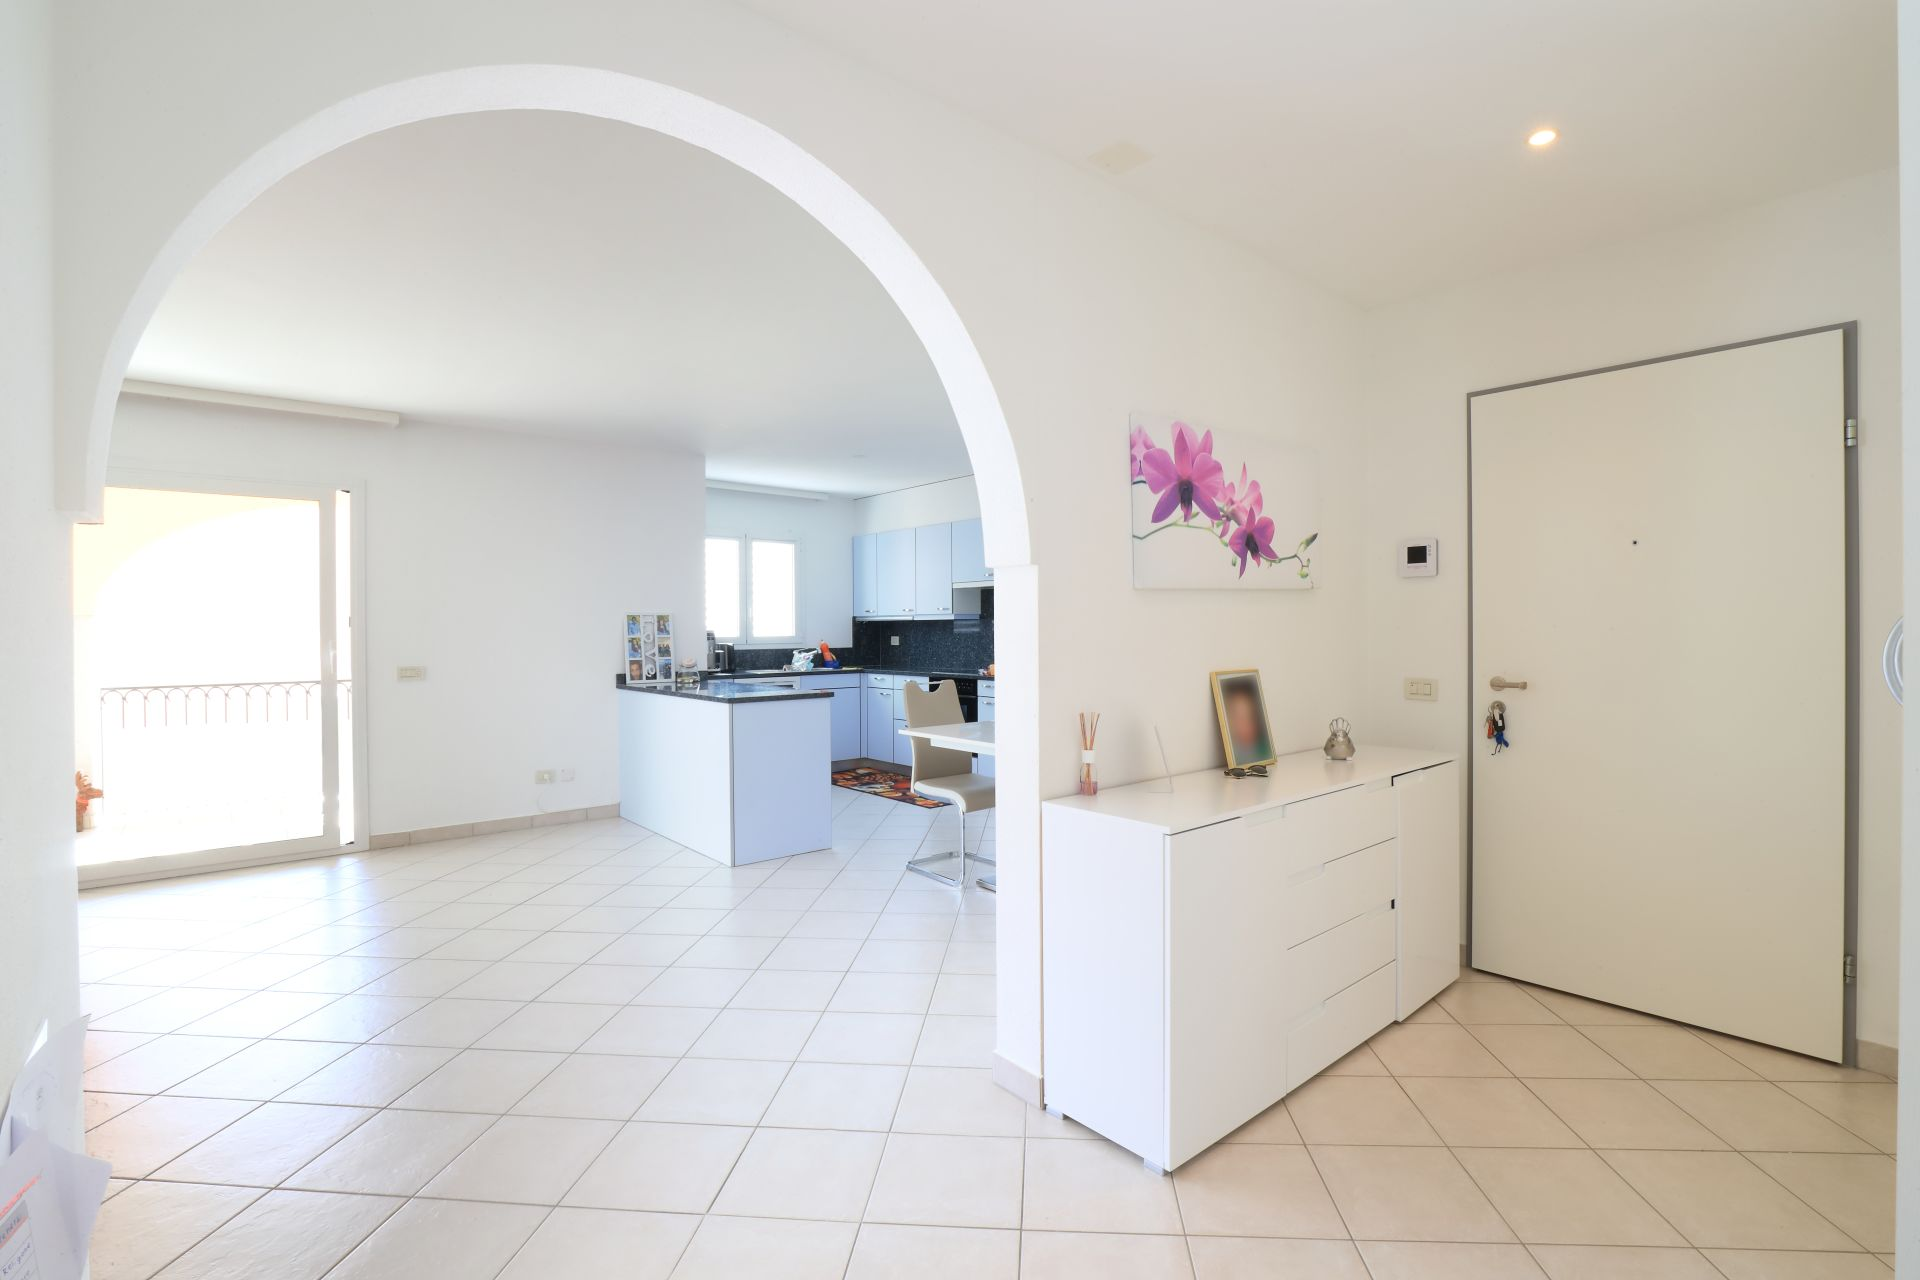 Grande, moderno e luminoso appartamento